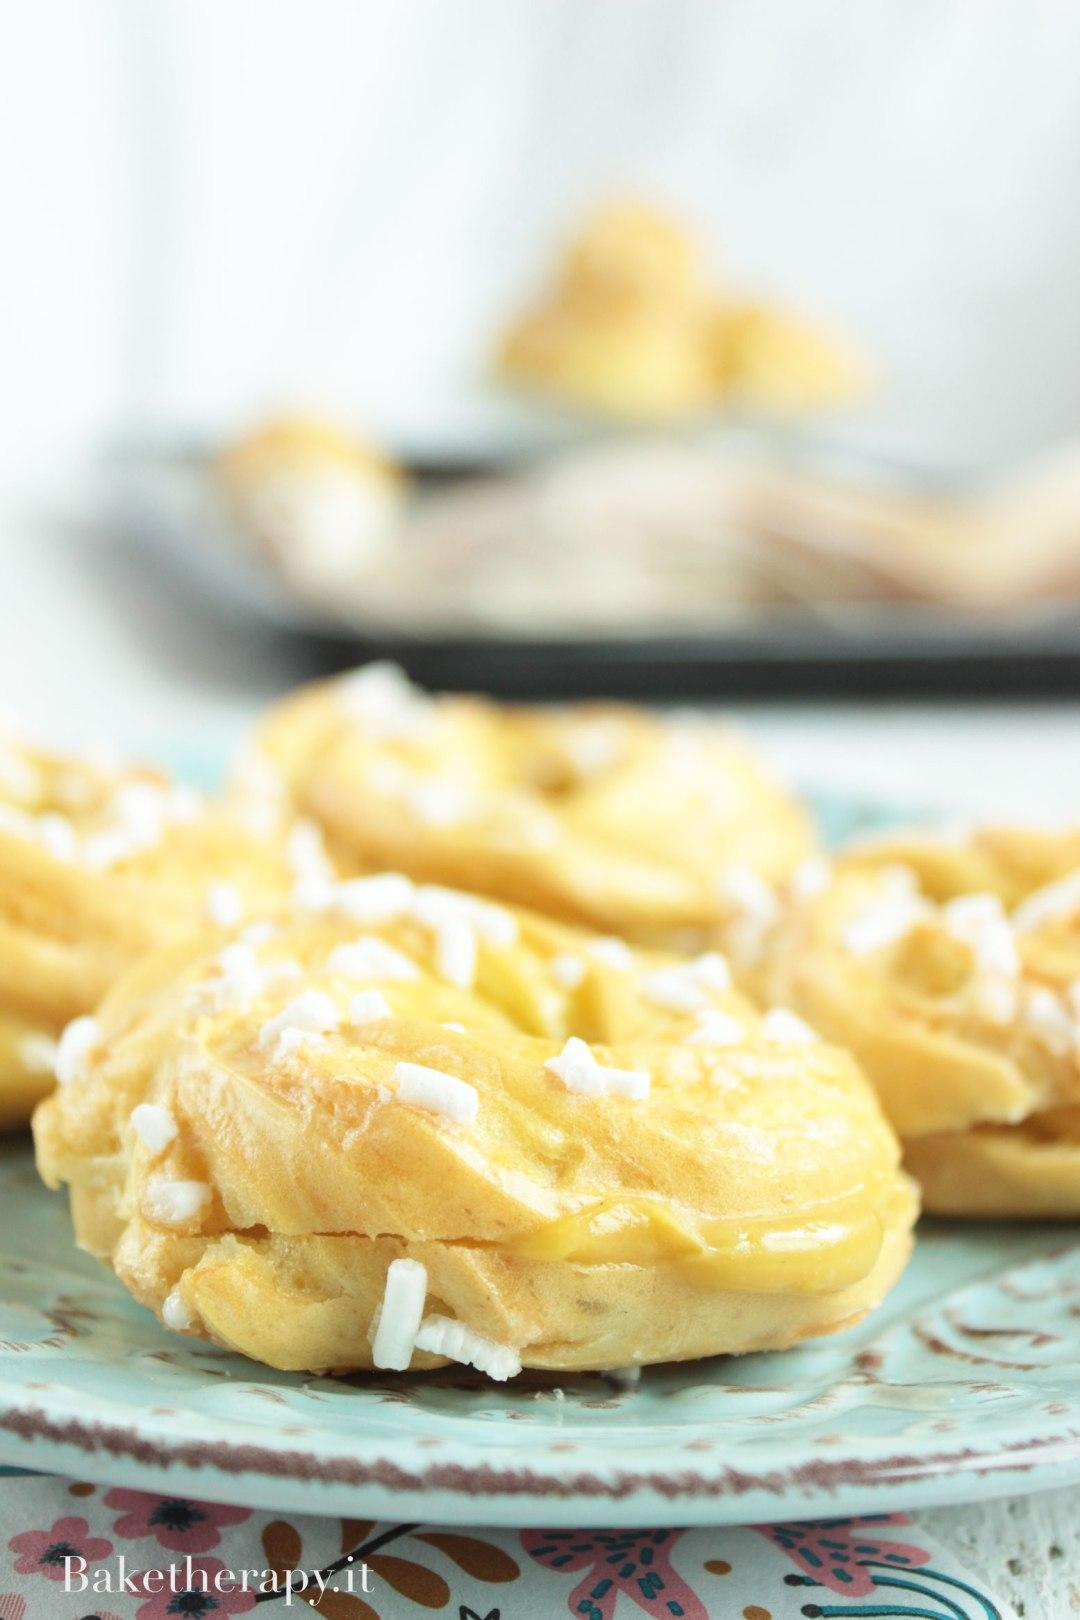 Pasta choux all'olio di oliva